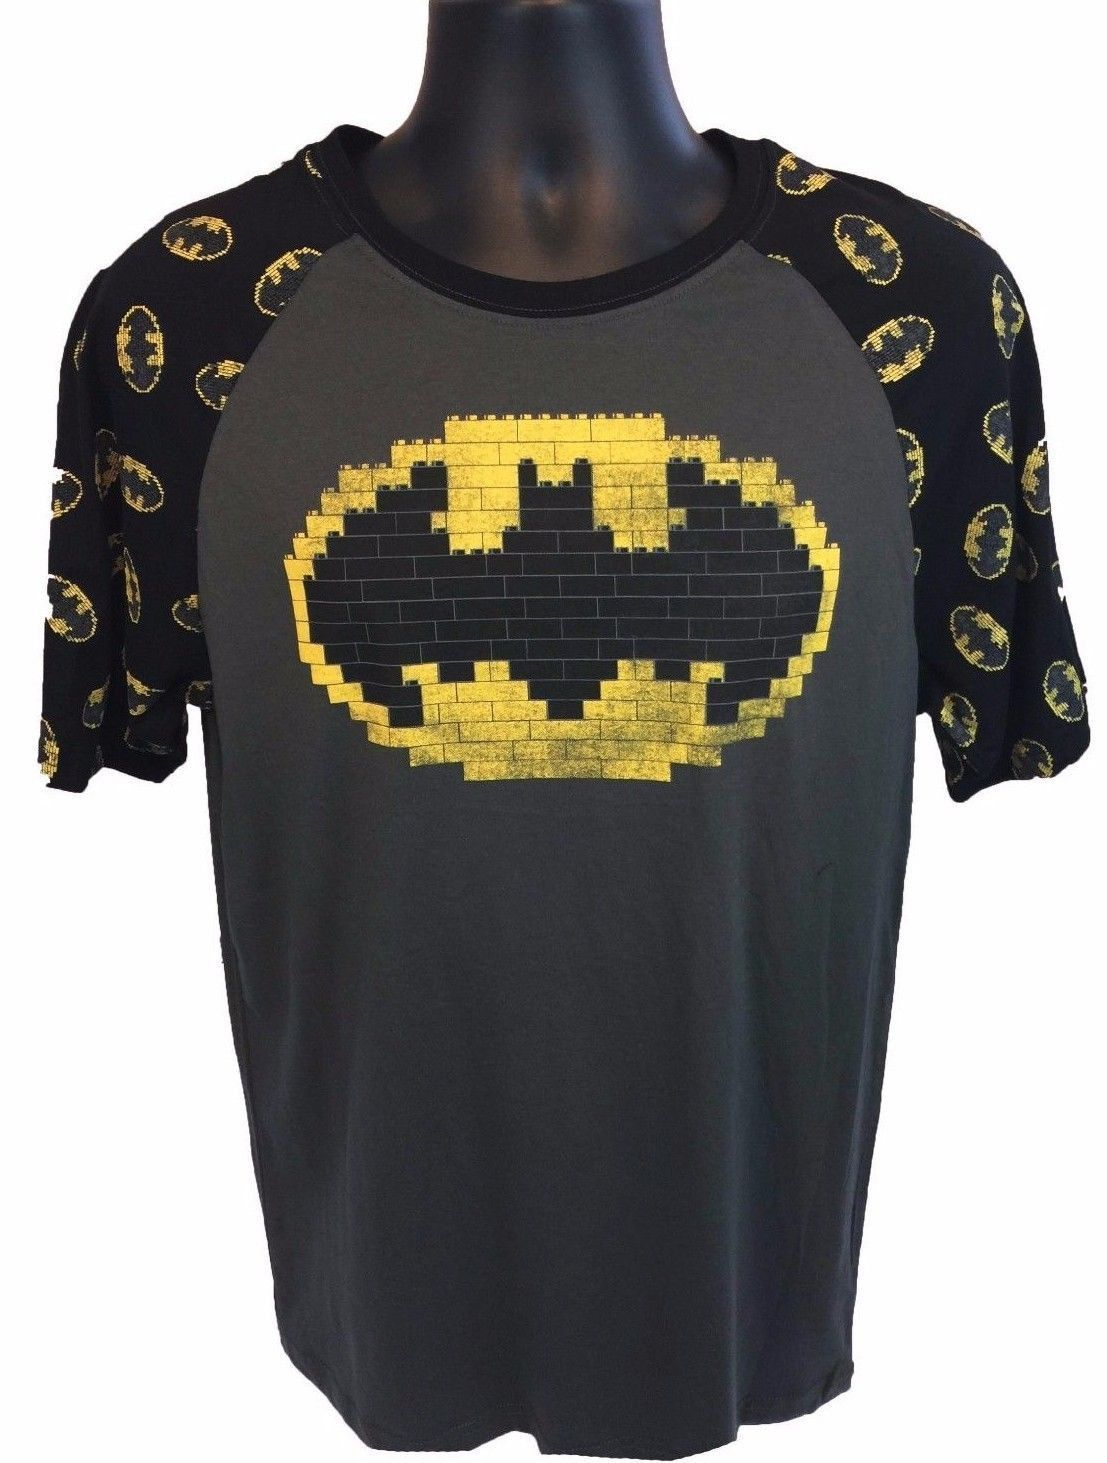 New LEGO BATMAN MOVIE Bat Signal Mens T-Shirt Size Large Dark Gray Cotton Tee